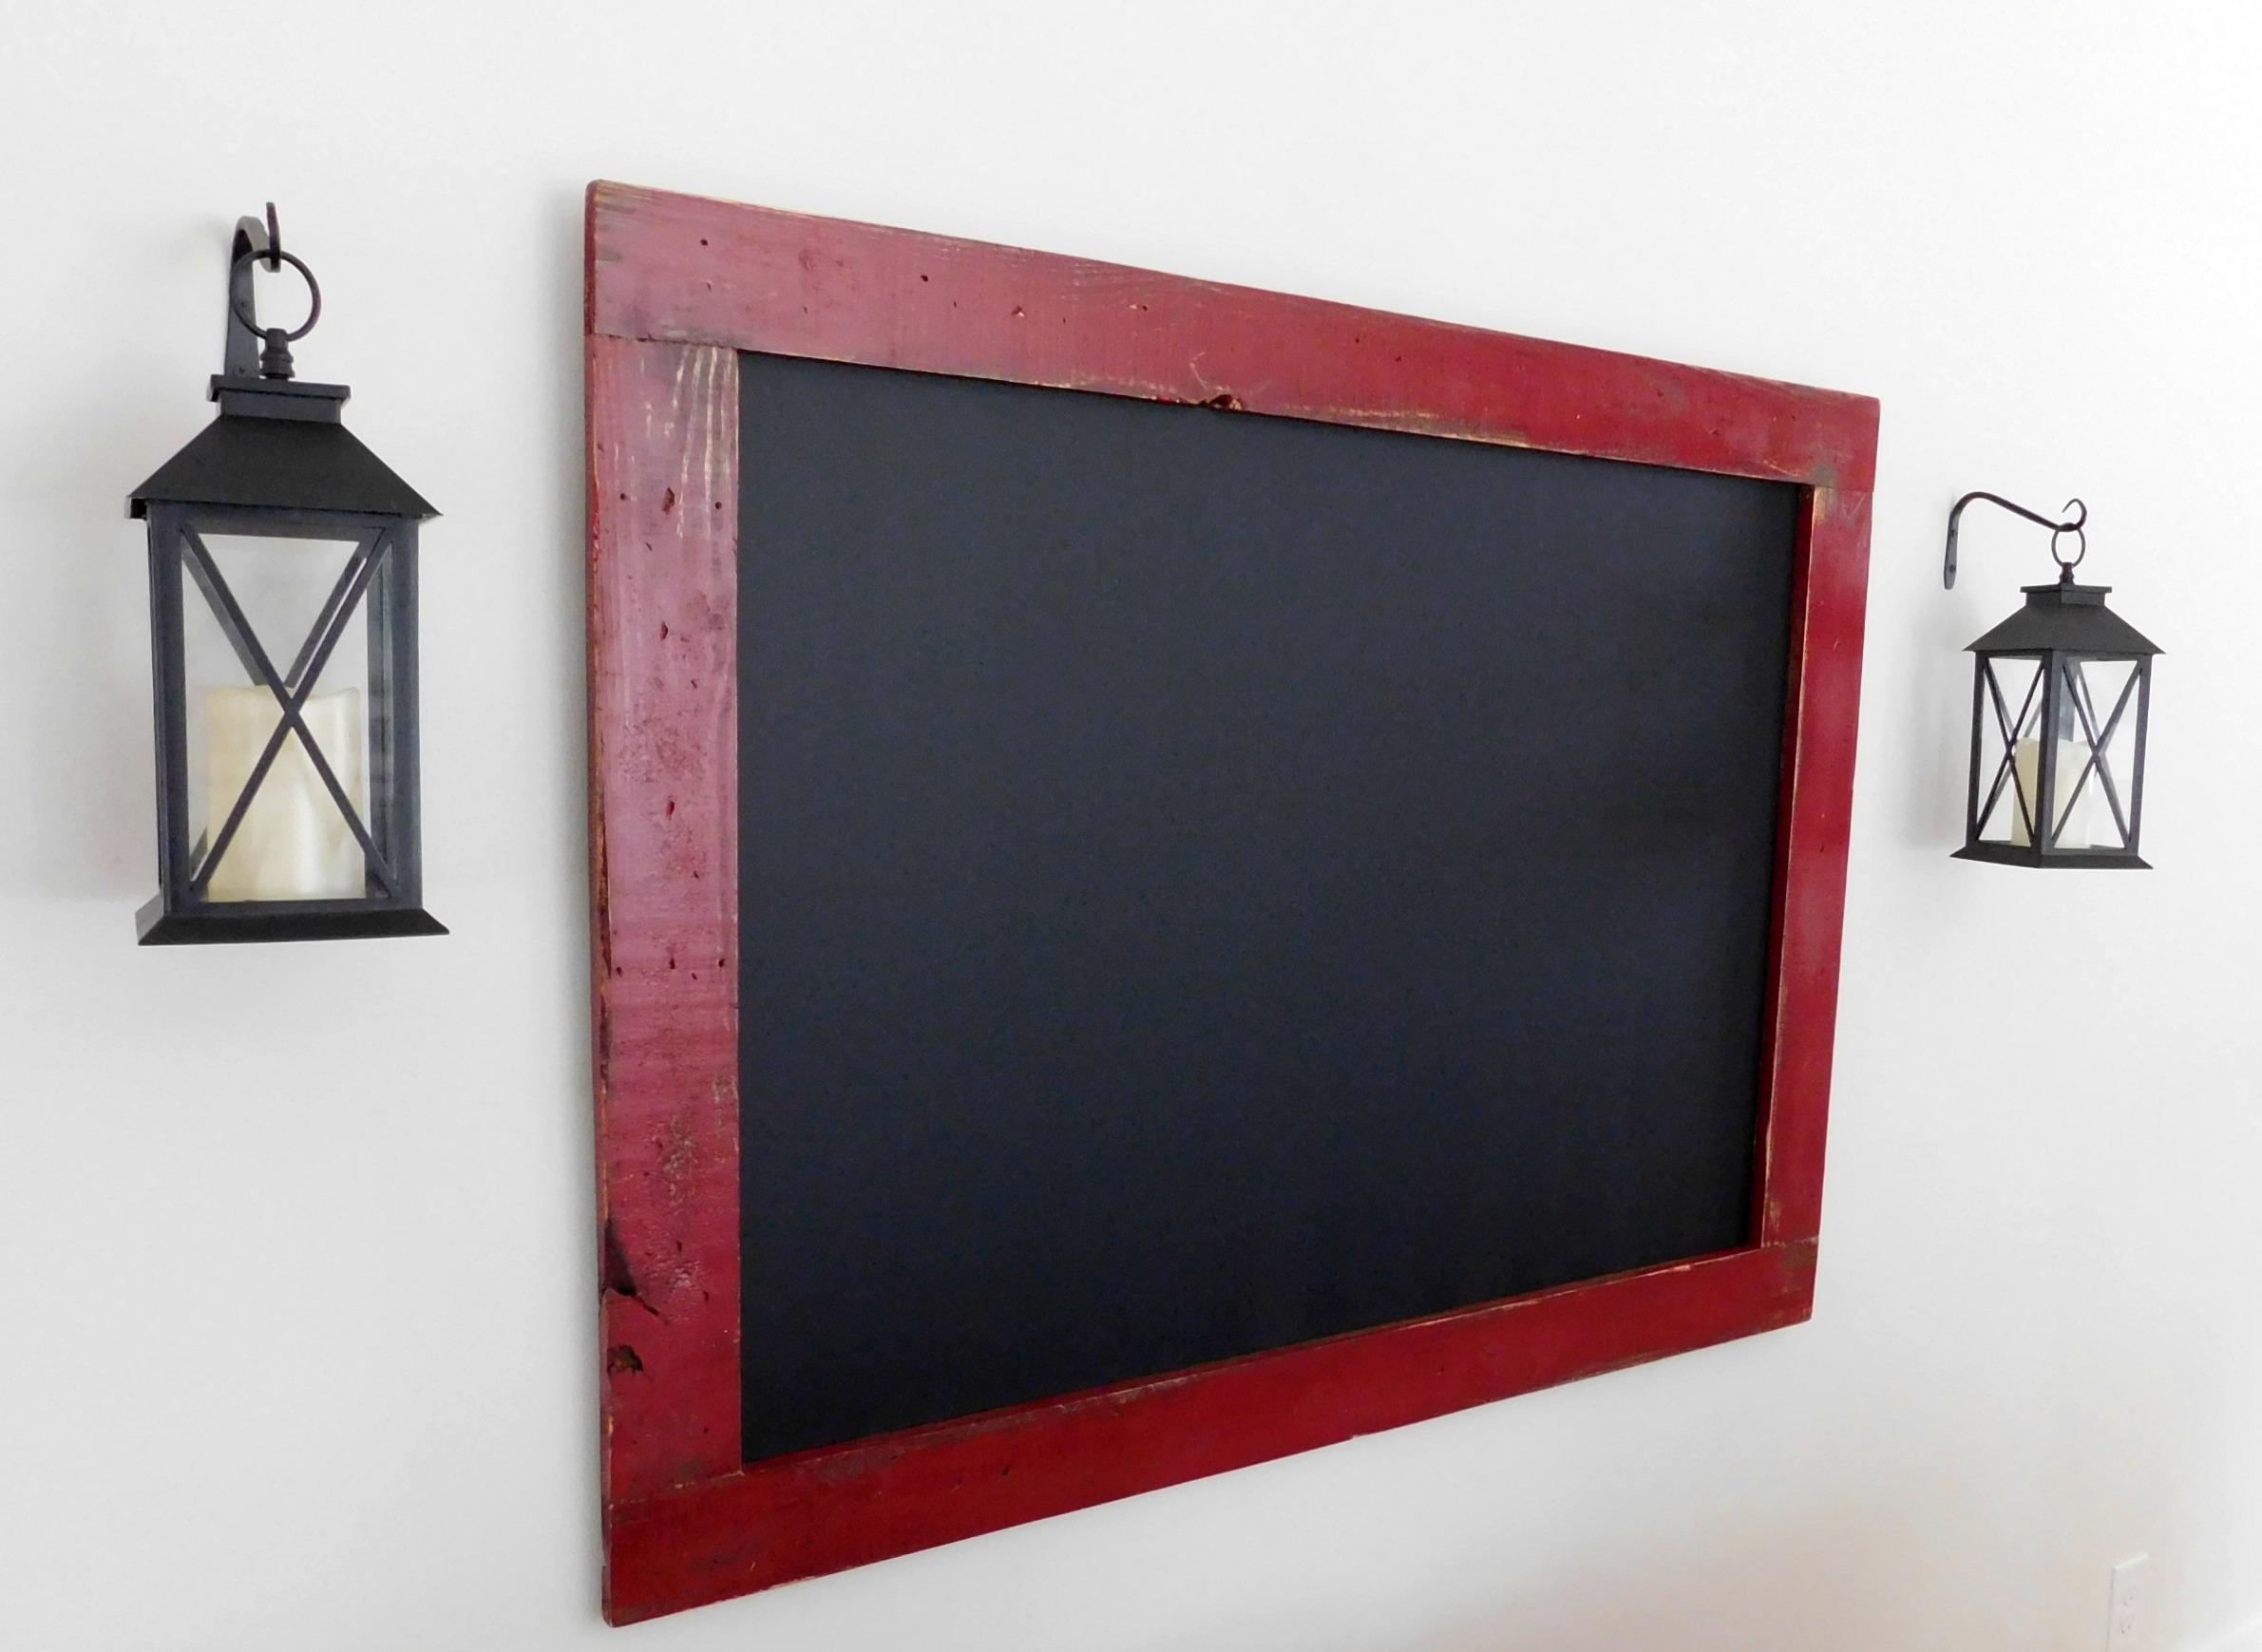 Framed Chalkboard for your Restaurant or Home